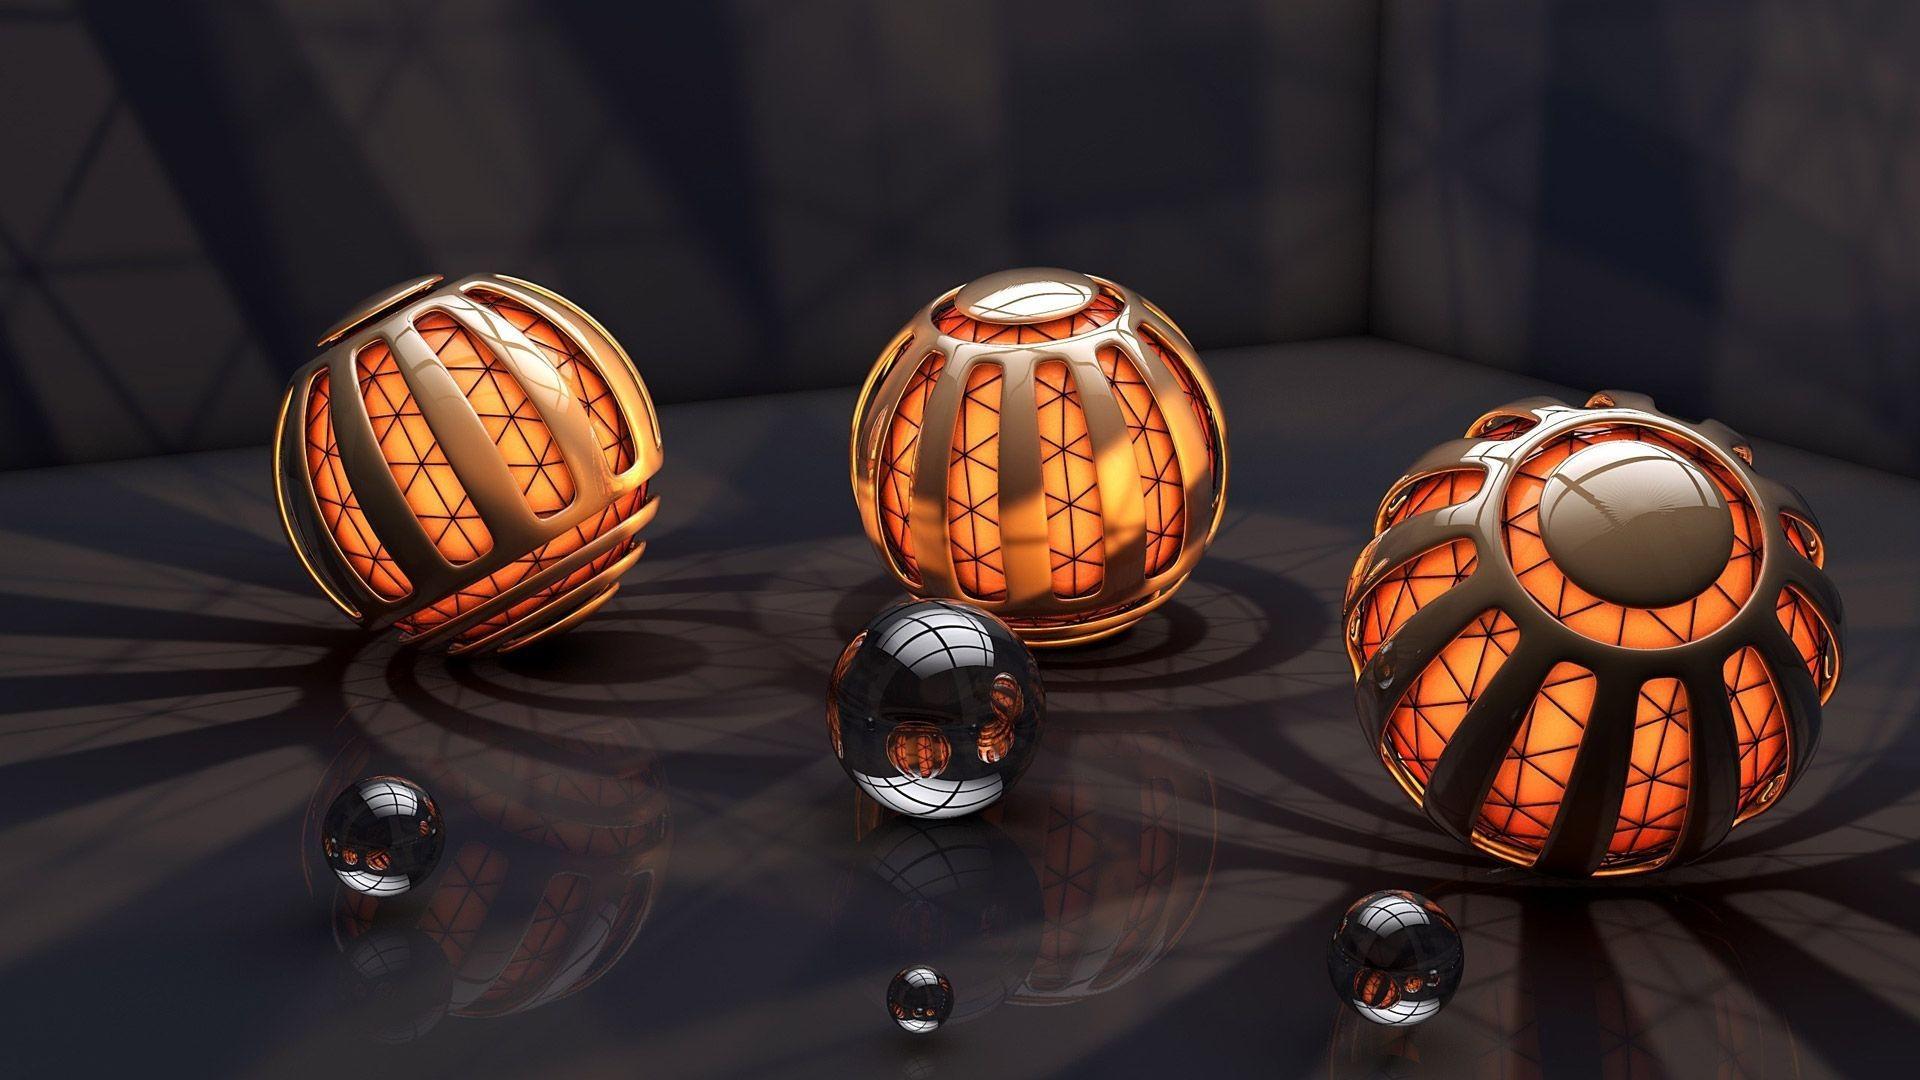 3D-Black-and-Orange-Balls-Wallpapers.jpg